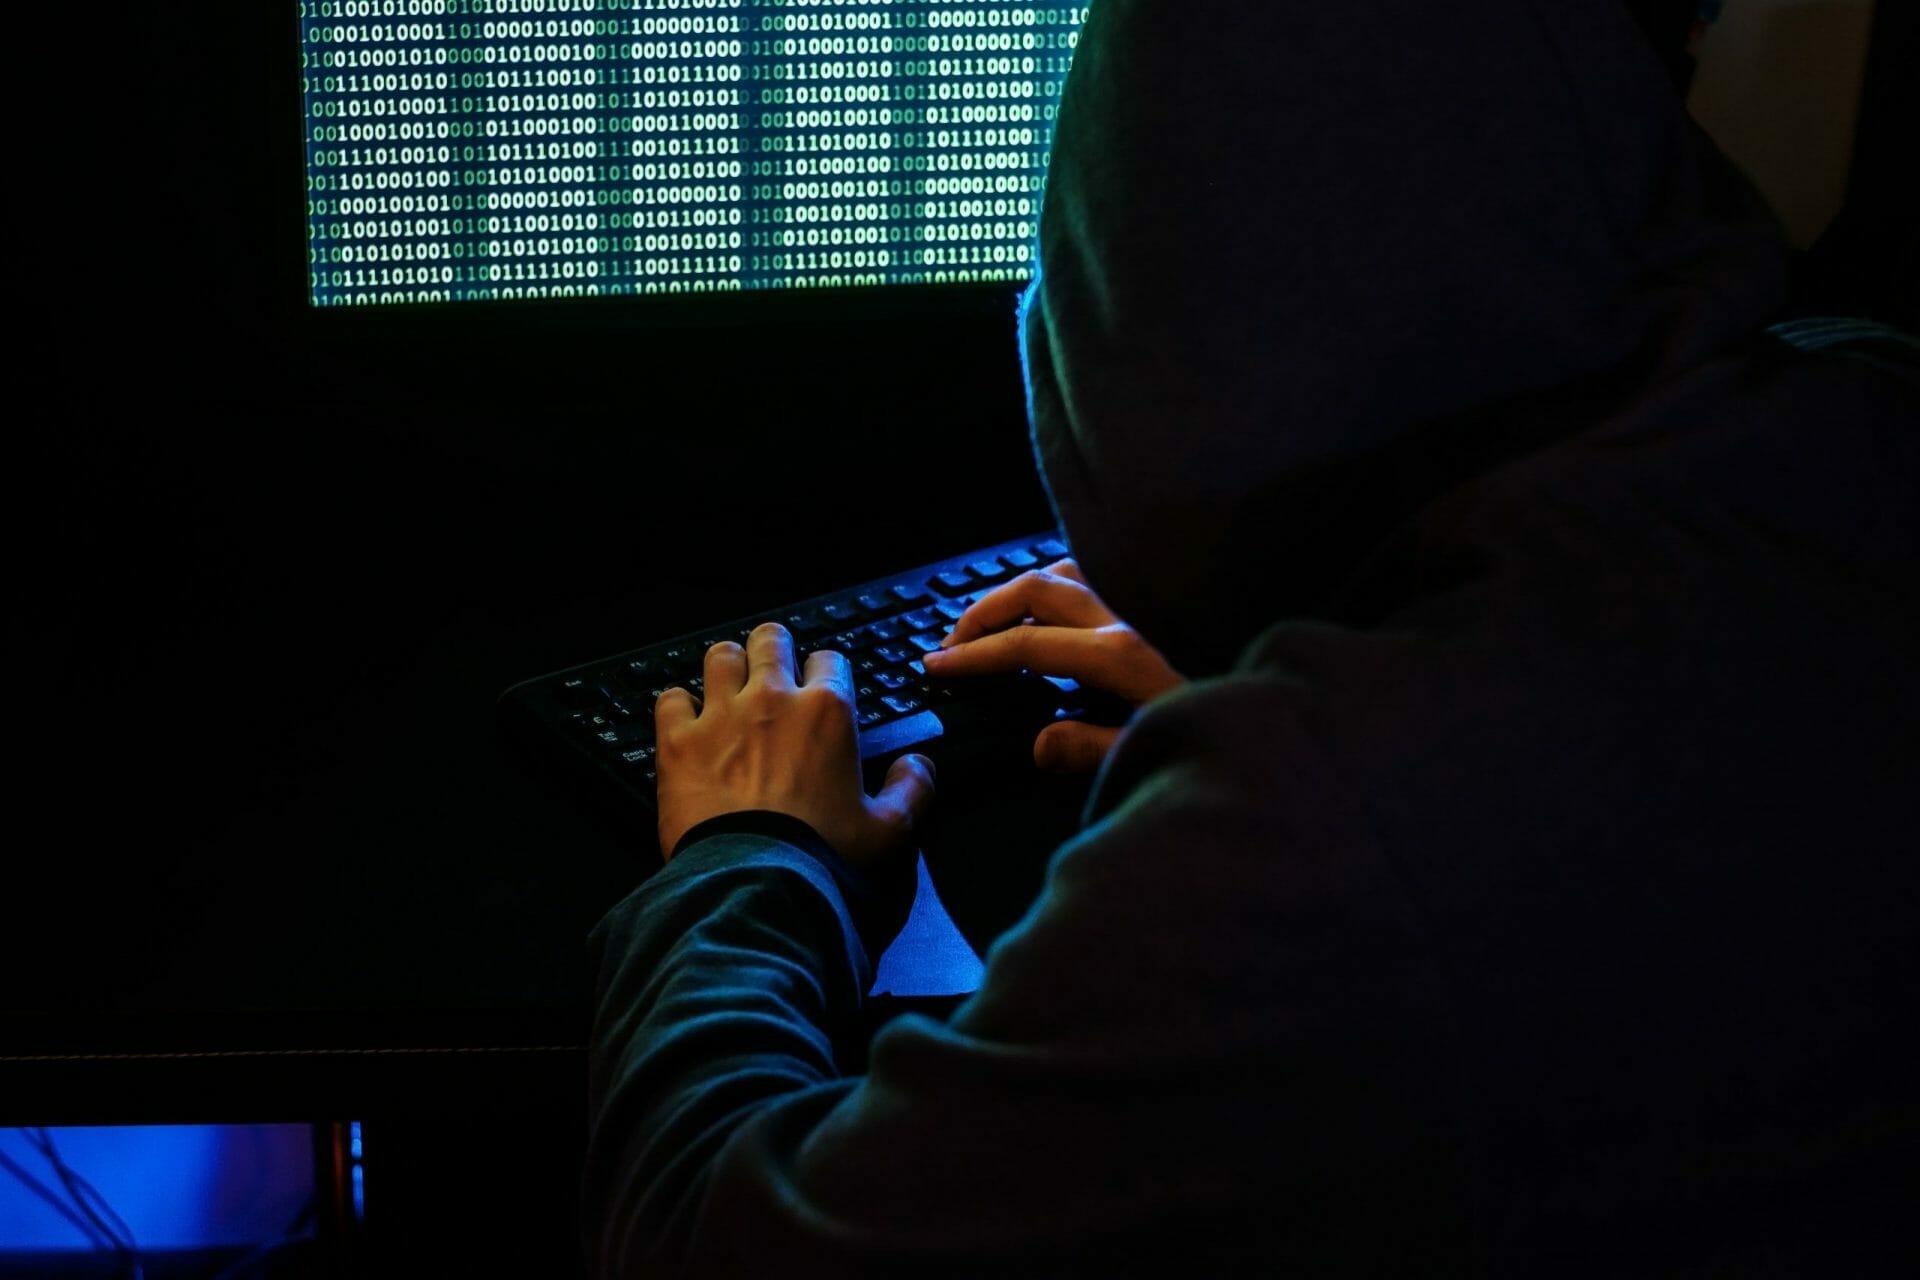 cybercrime through the internet